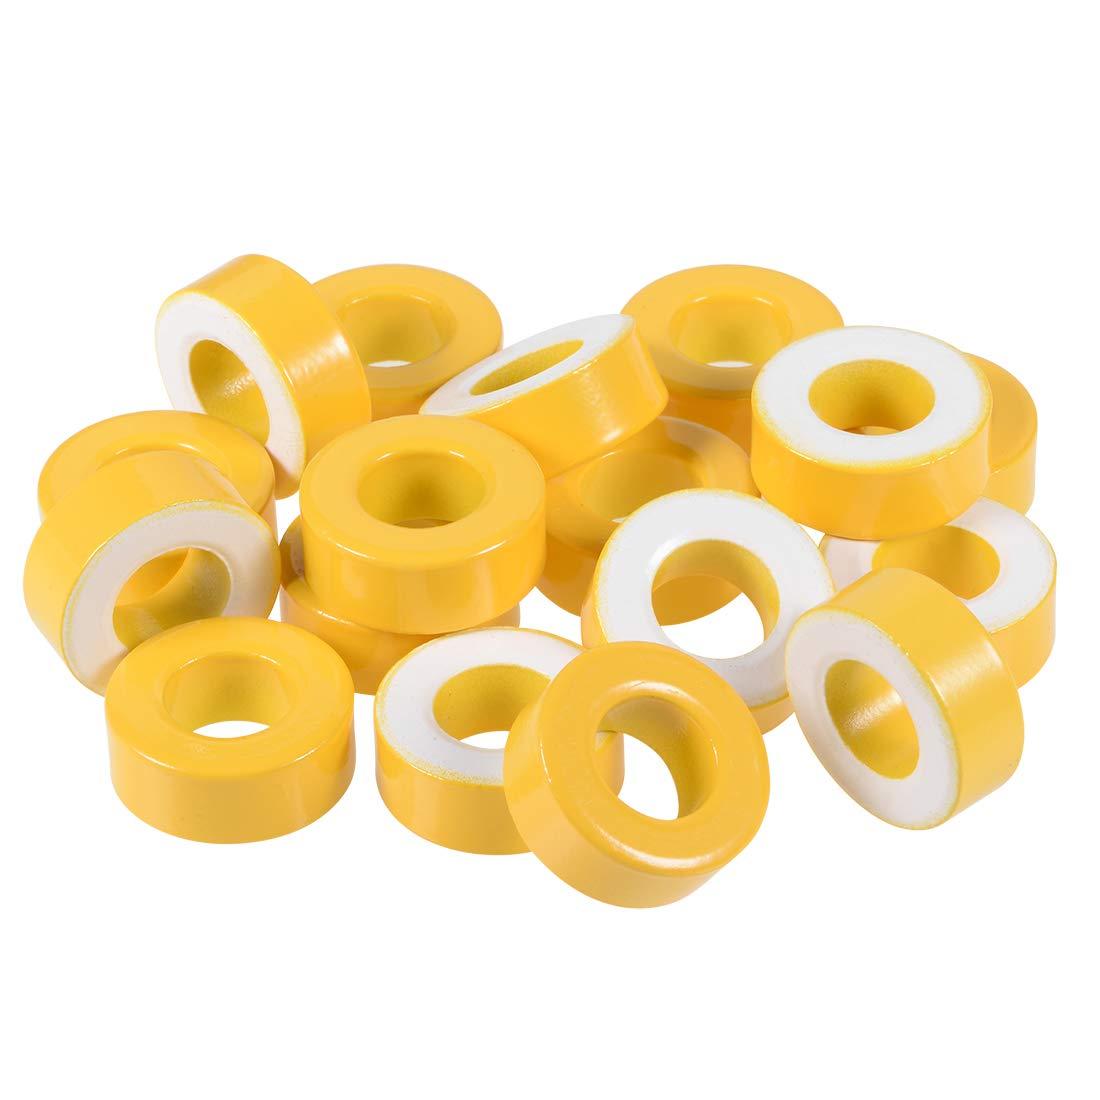 uxcell 17pcs 14.2 x 27.3 x 11mm Ferrite Ring Iron Powder Toroid Cores Yellow White